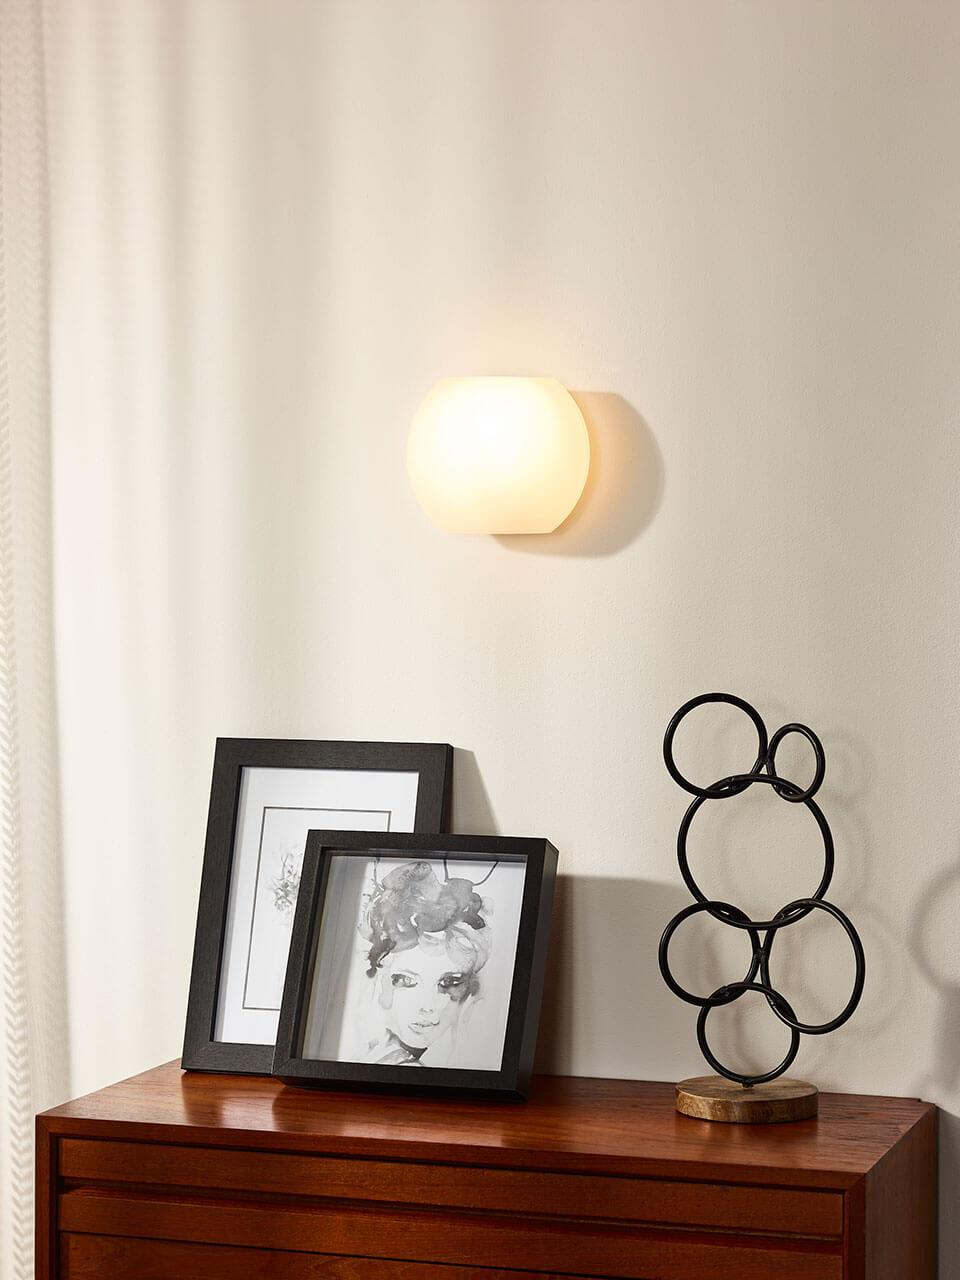 Настенный светильник Lucide Lagan 20226/20/61 цены онлайн